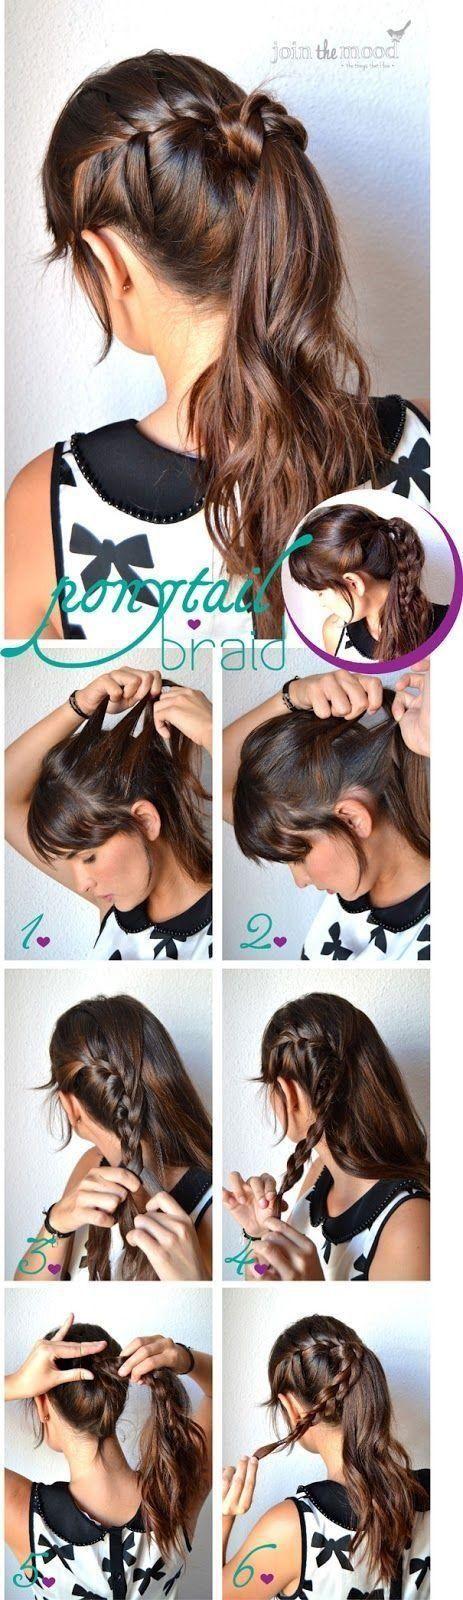 Natural Braided Ponytail